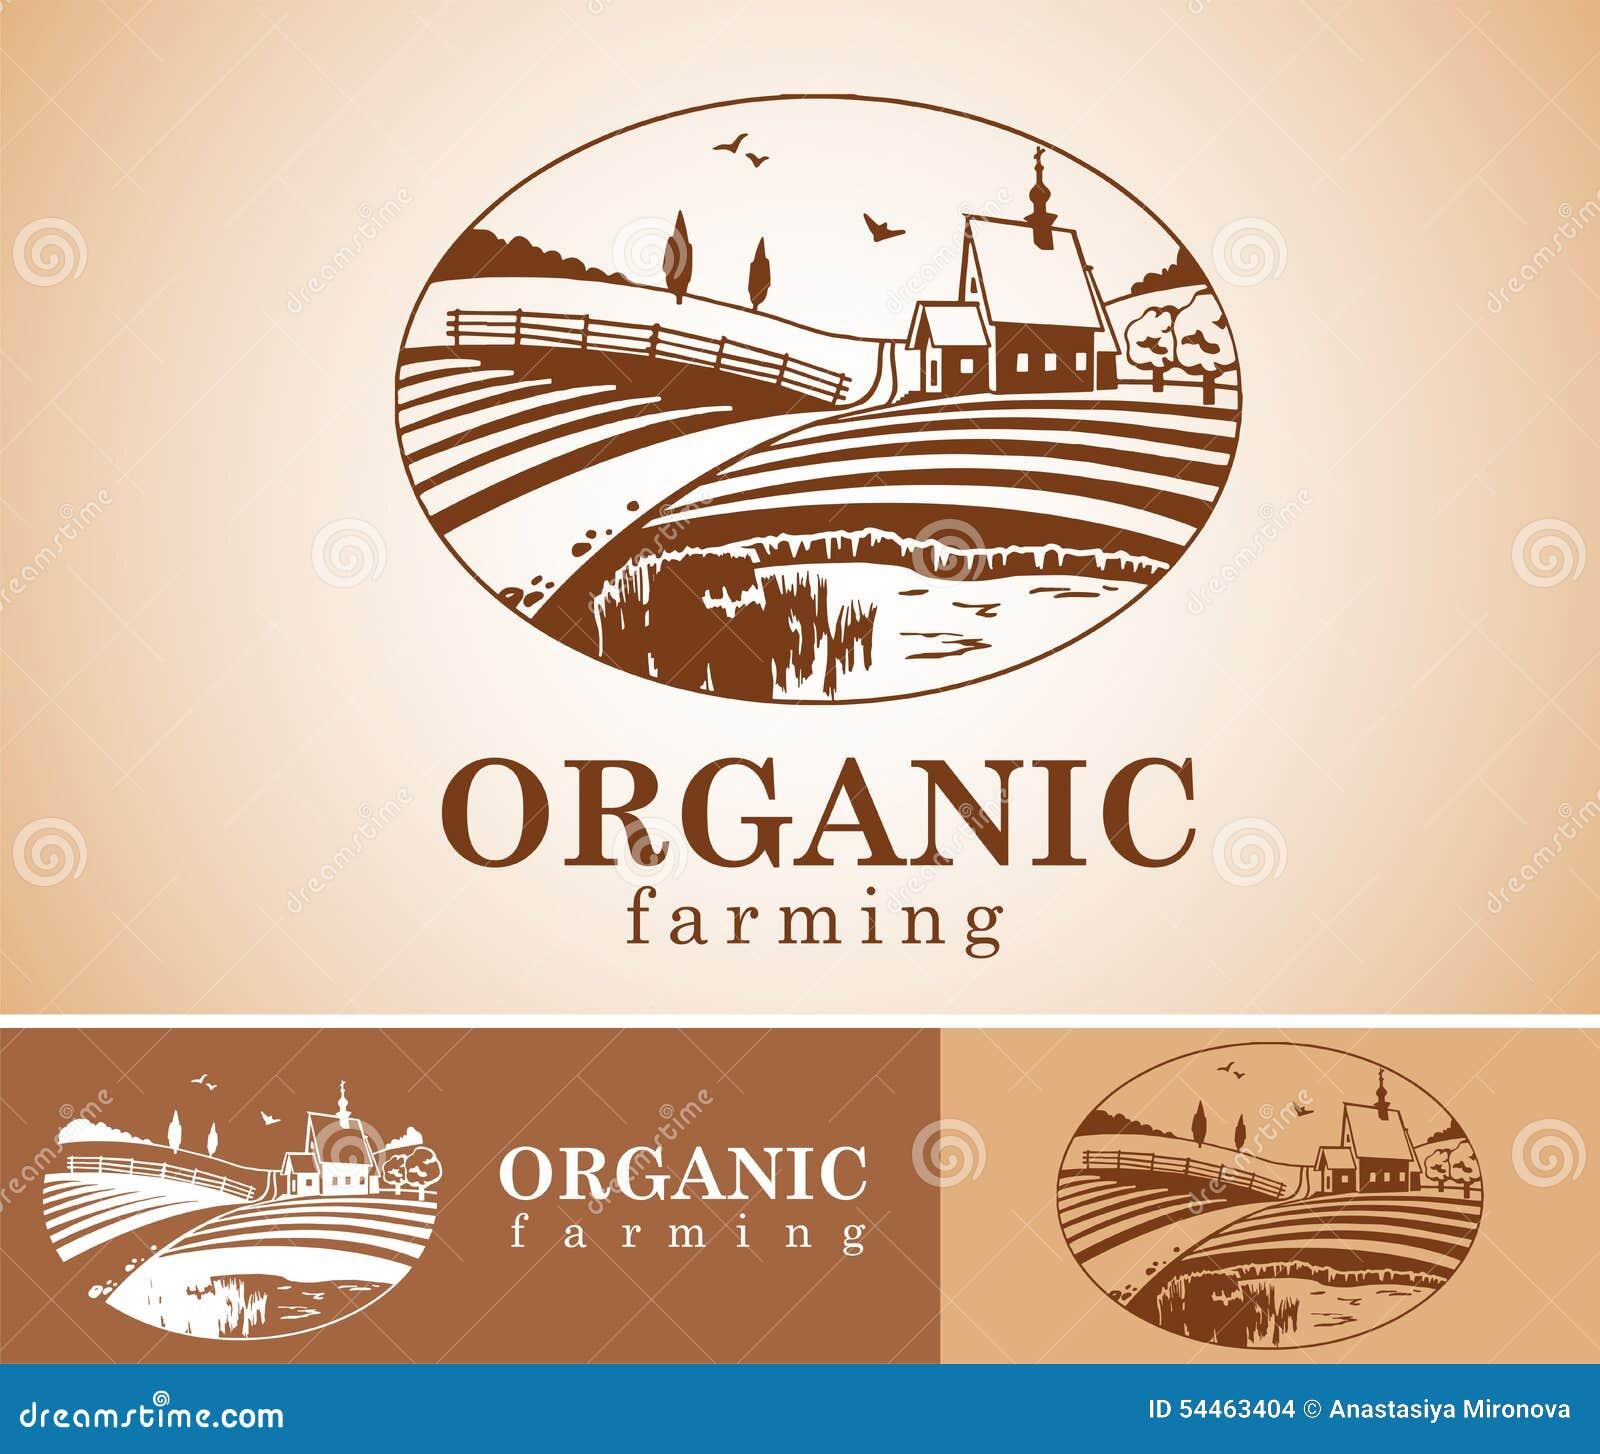 Organic Farming Design Element Stock Vector Image 54463404